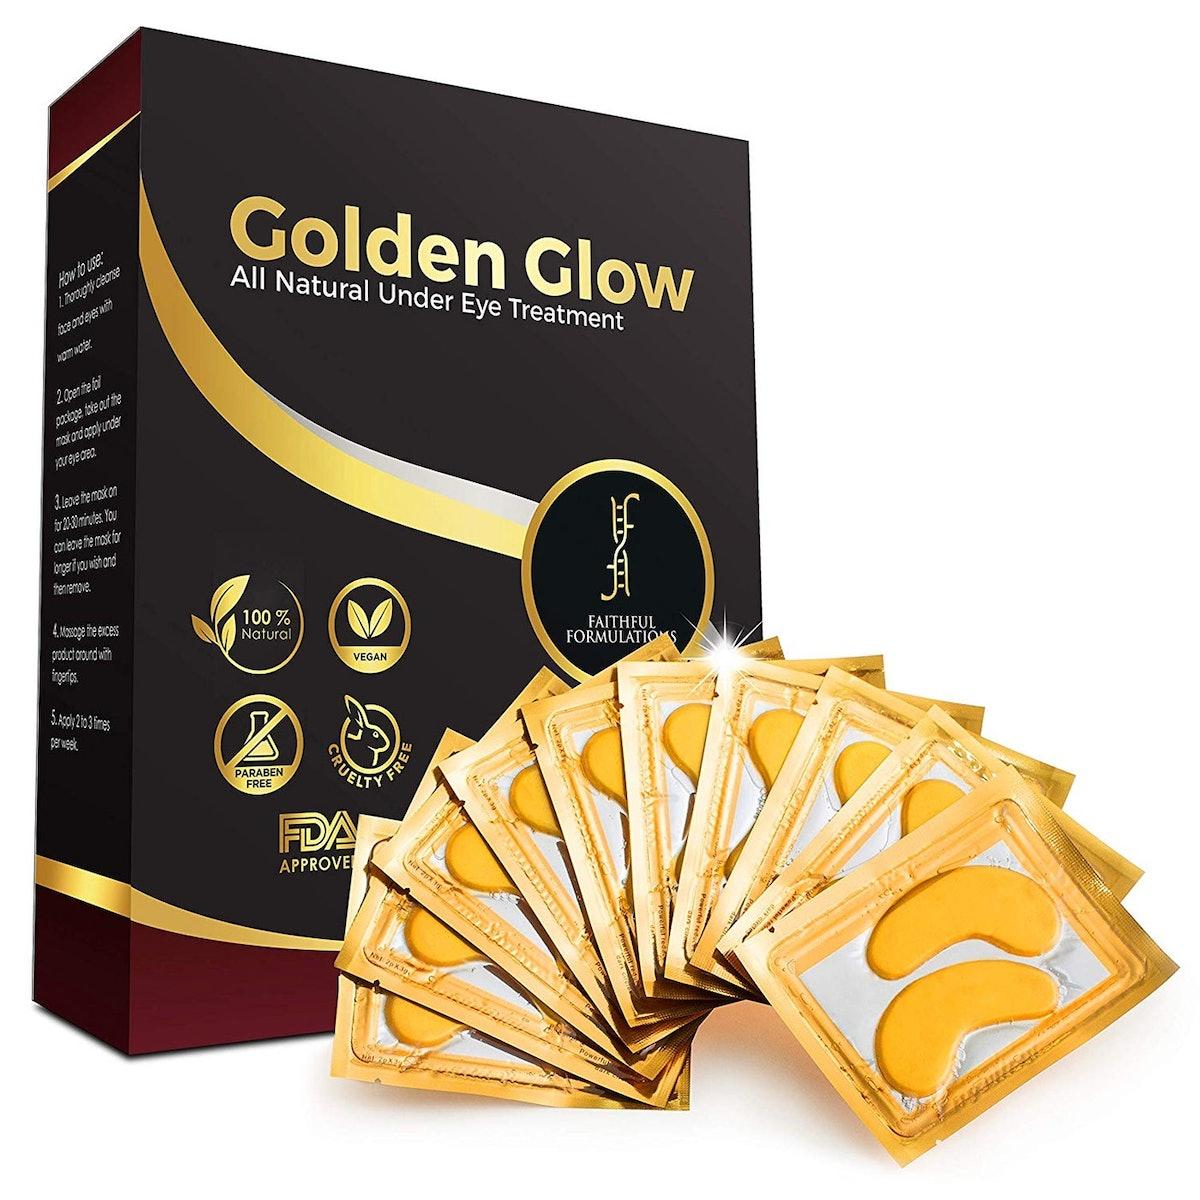 Faithful Formulations 24K Golden Glow